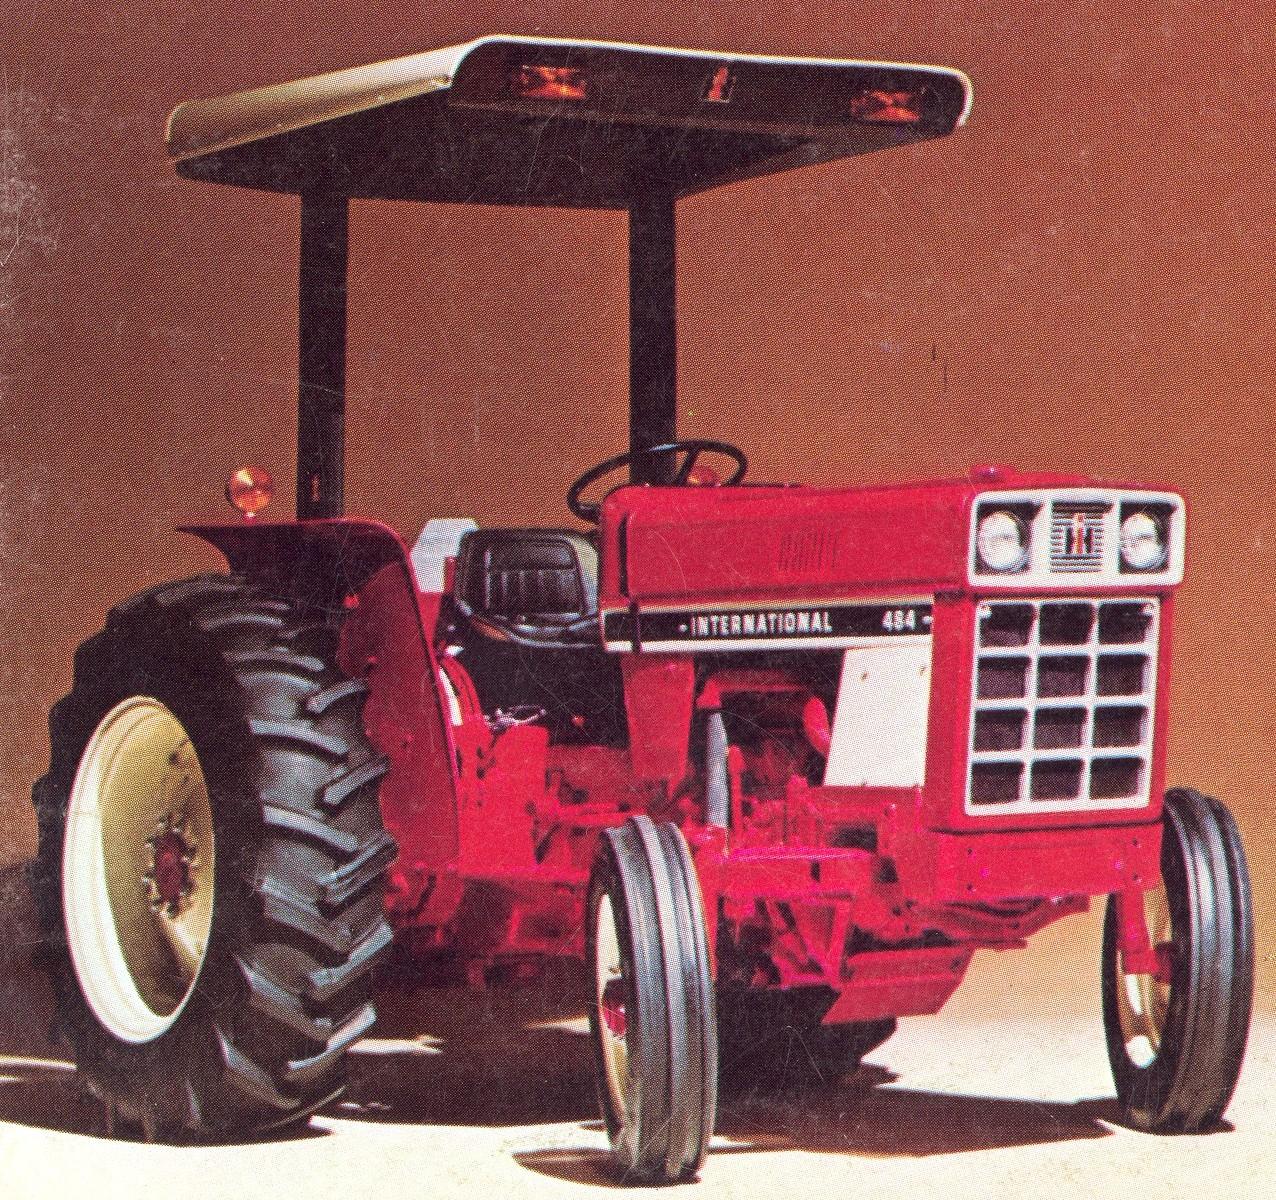 International Harvester 464 Tractor Parts : International tractor construction plant wiki